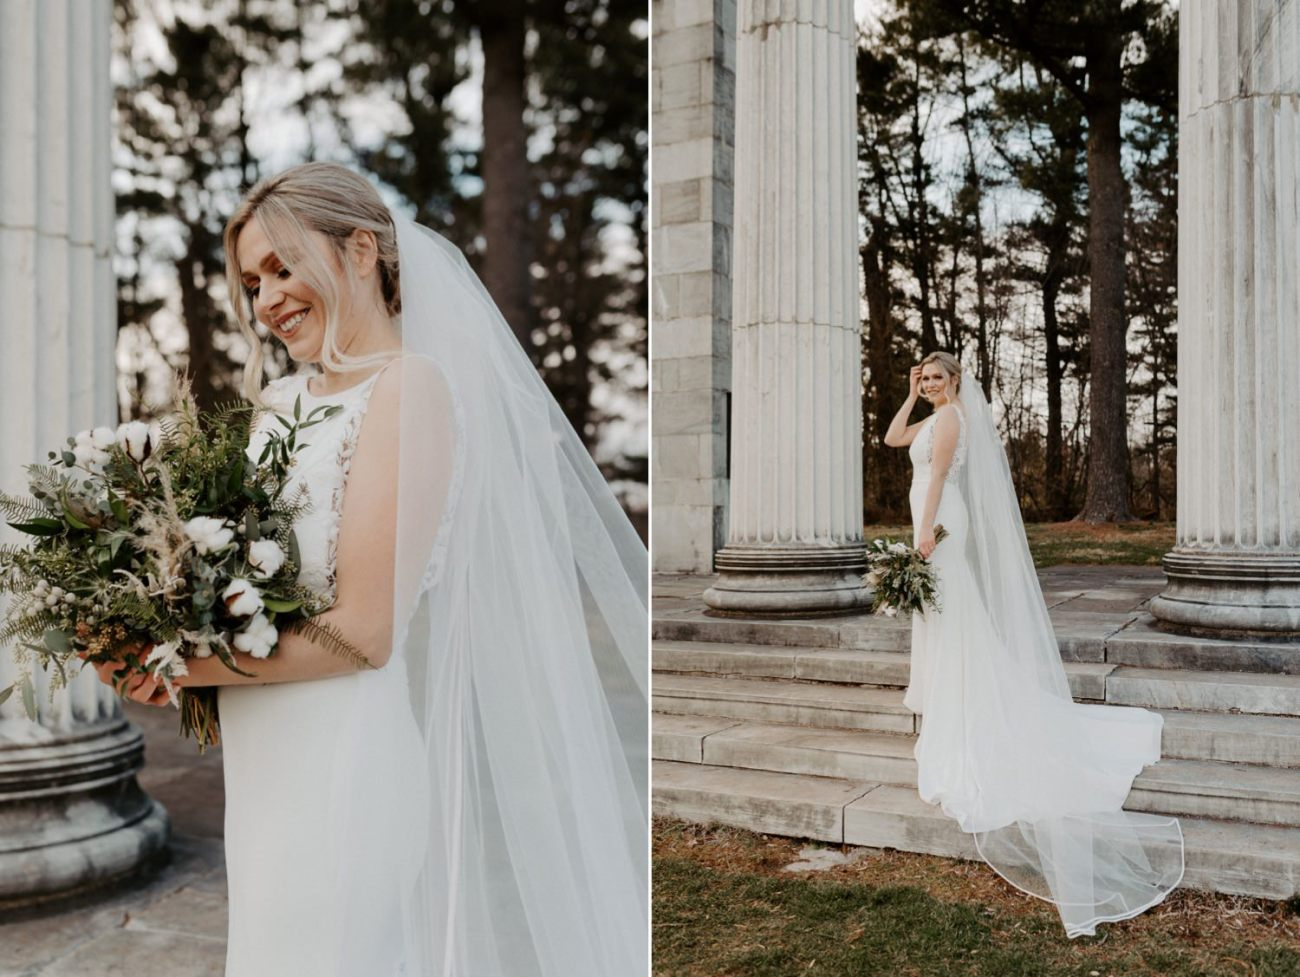 Princeton Battlefield Wedding Princeton University Elopement New Jersey Wedding Photographer Anais Possamai Photography 24